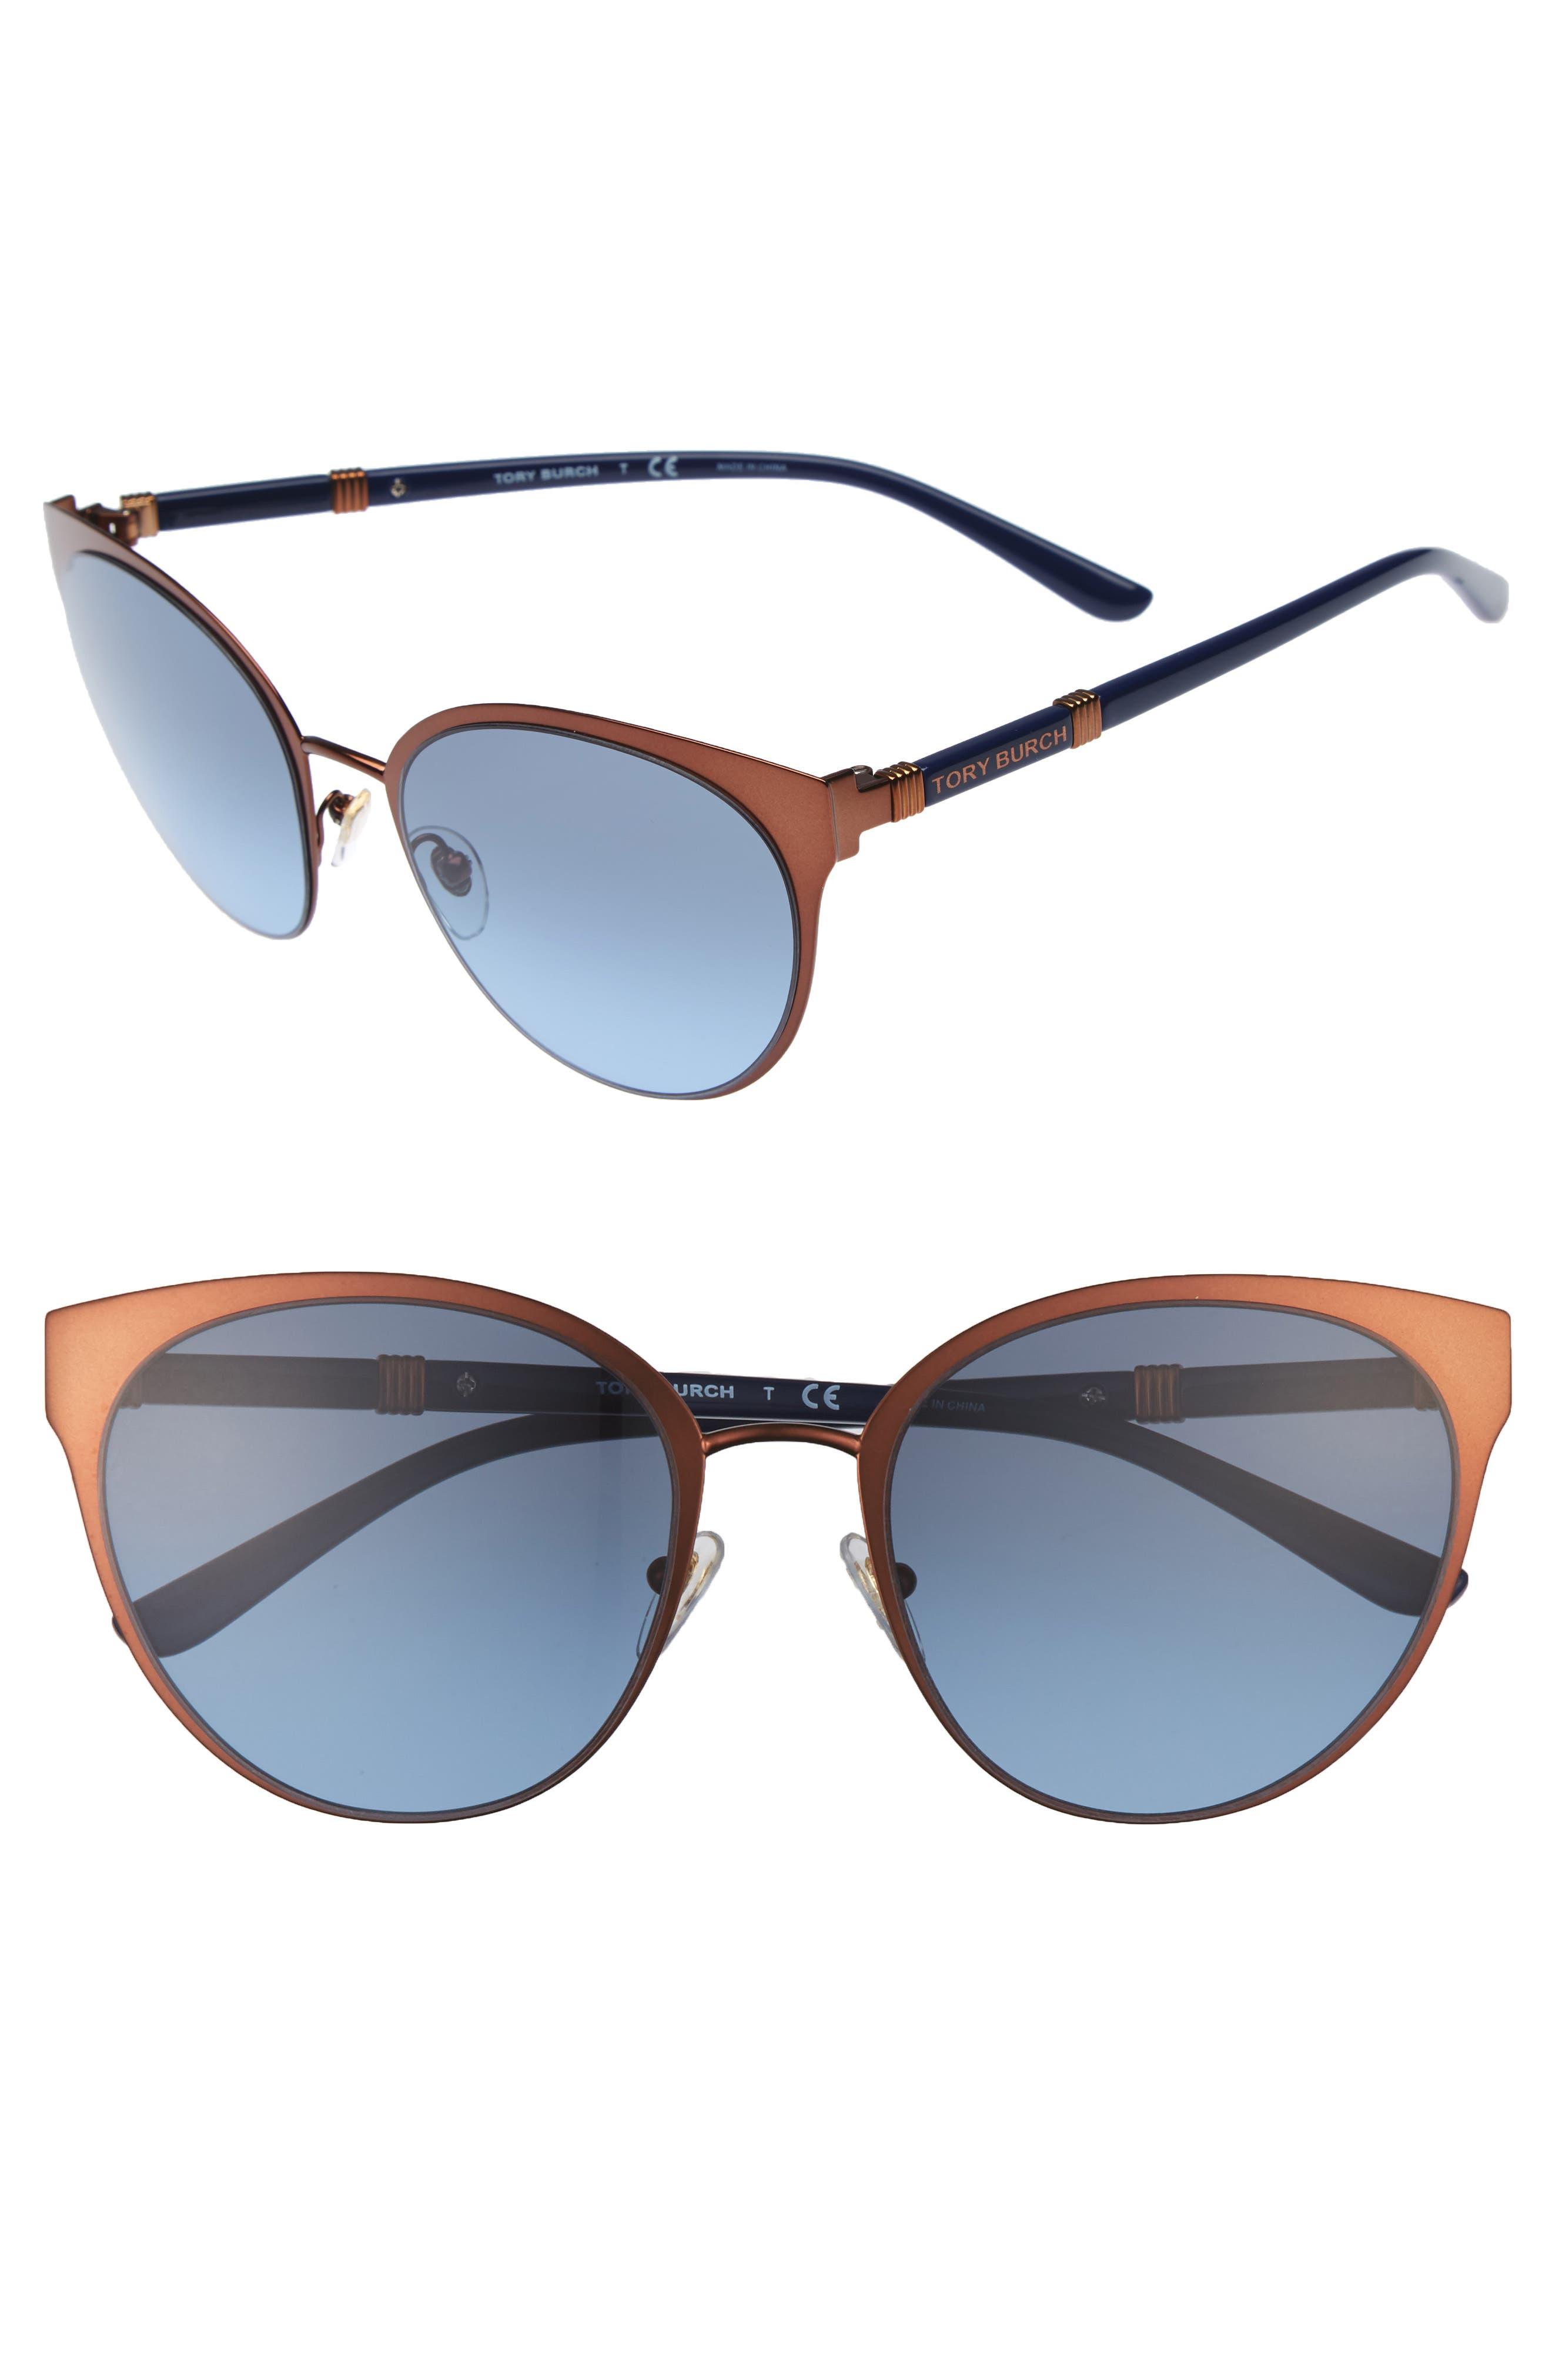 55mm Cat Eye Sunglasses,                         Main,                         color, 220